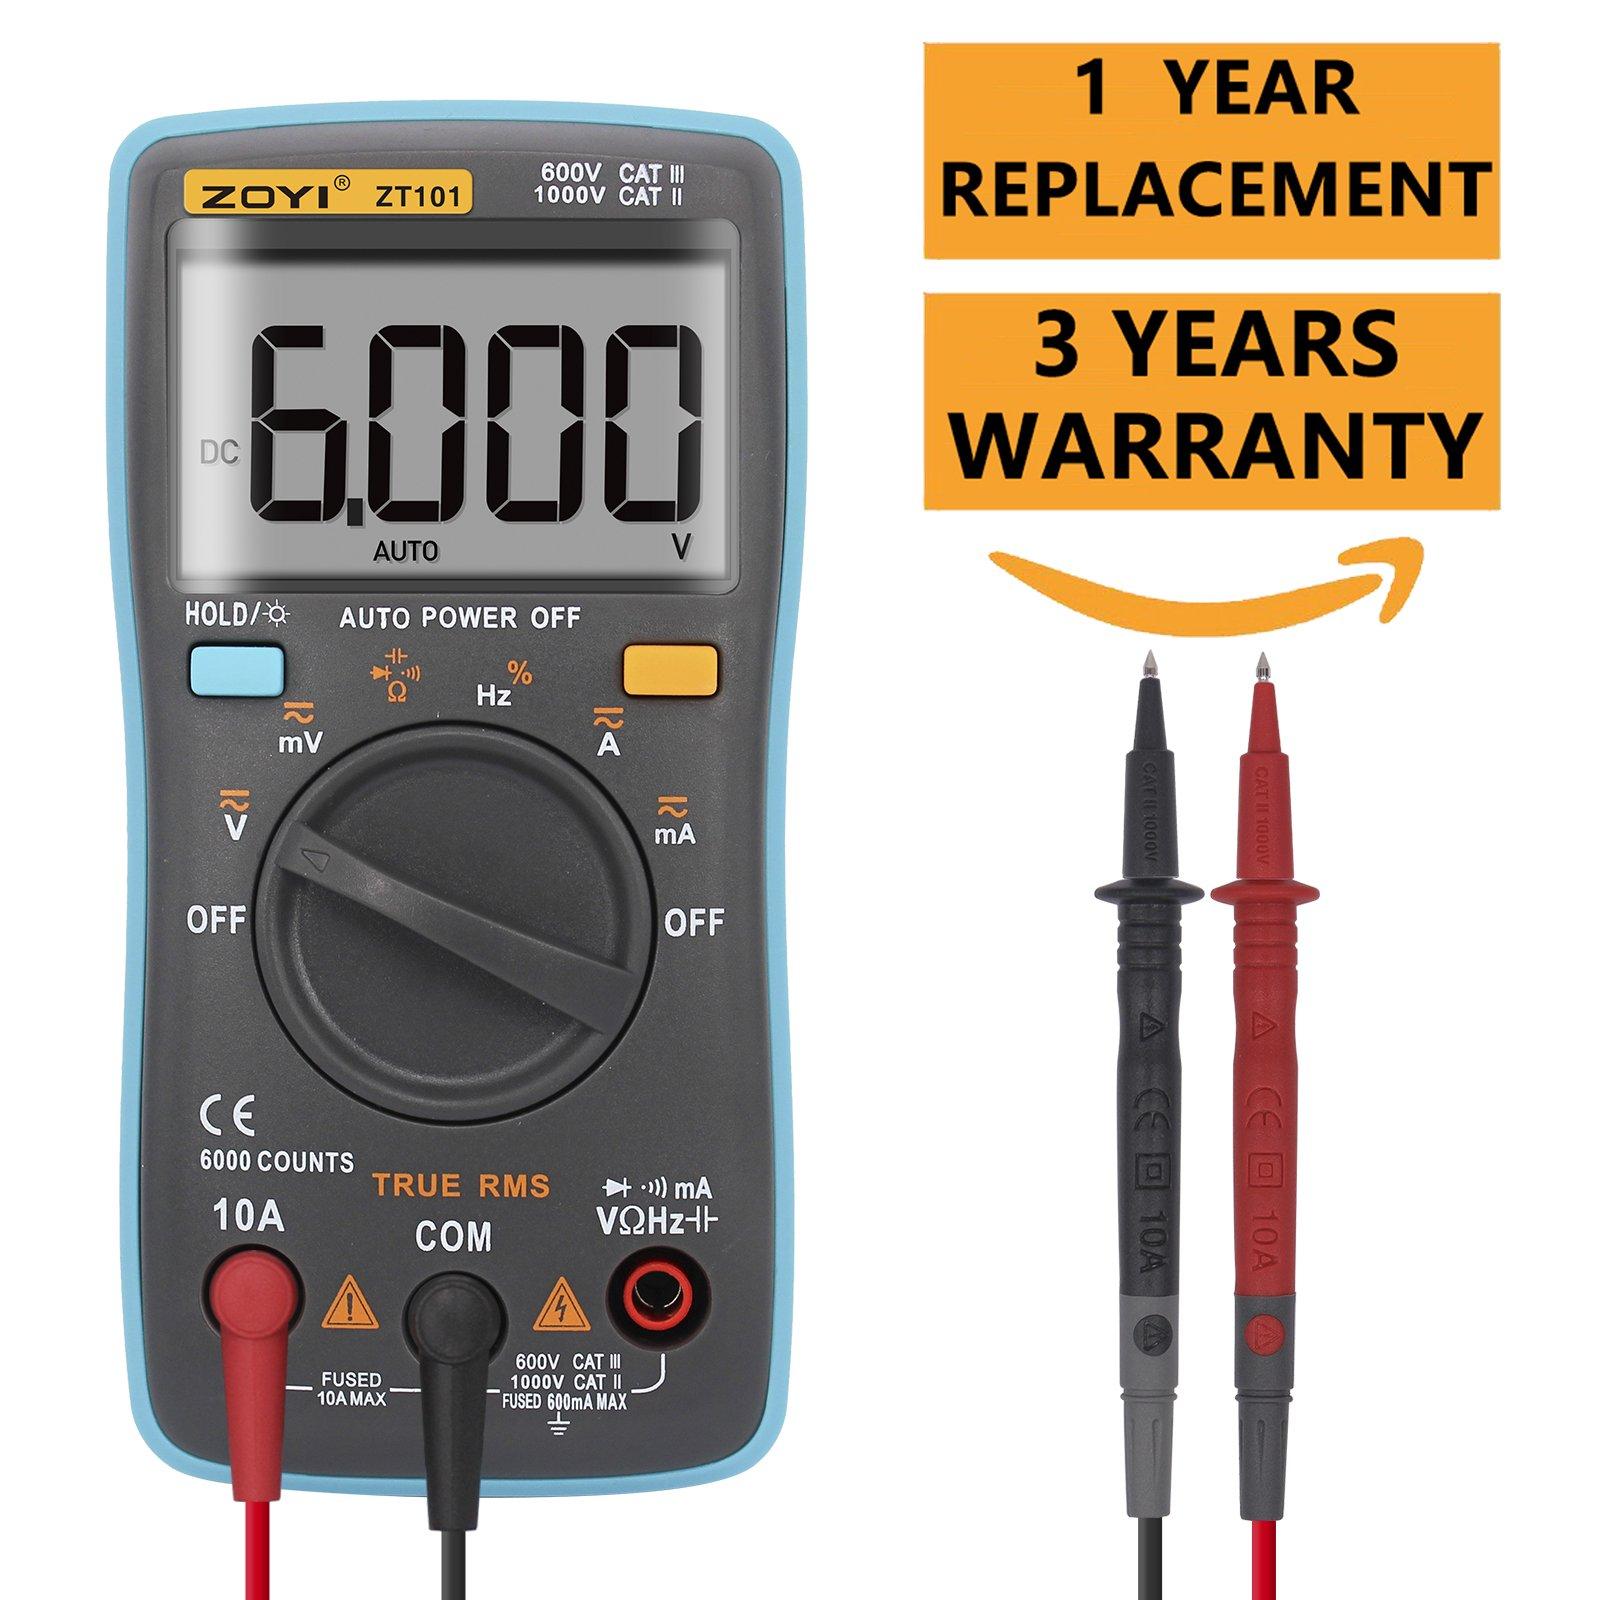 Digital Multimeter 6000 counts Palm-size True-RMS Multimeter Current Ohm Auto/Manual Backlight AC DC Voltage Ammeter